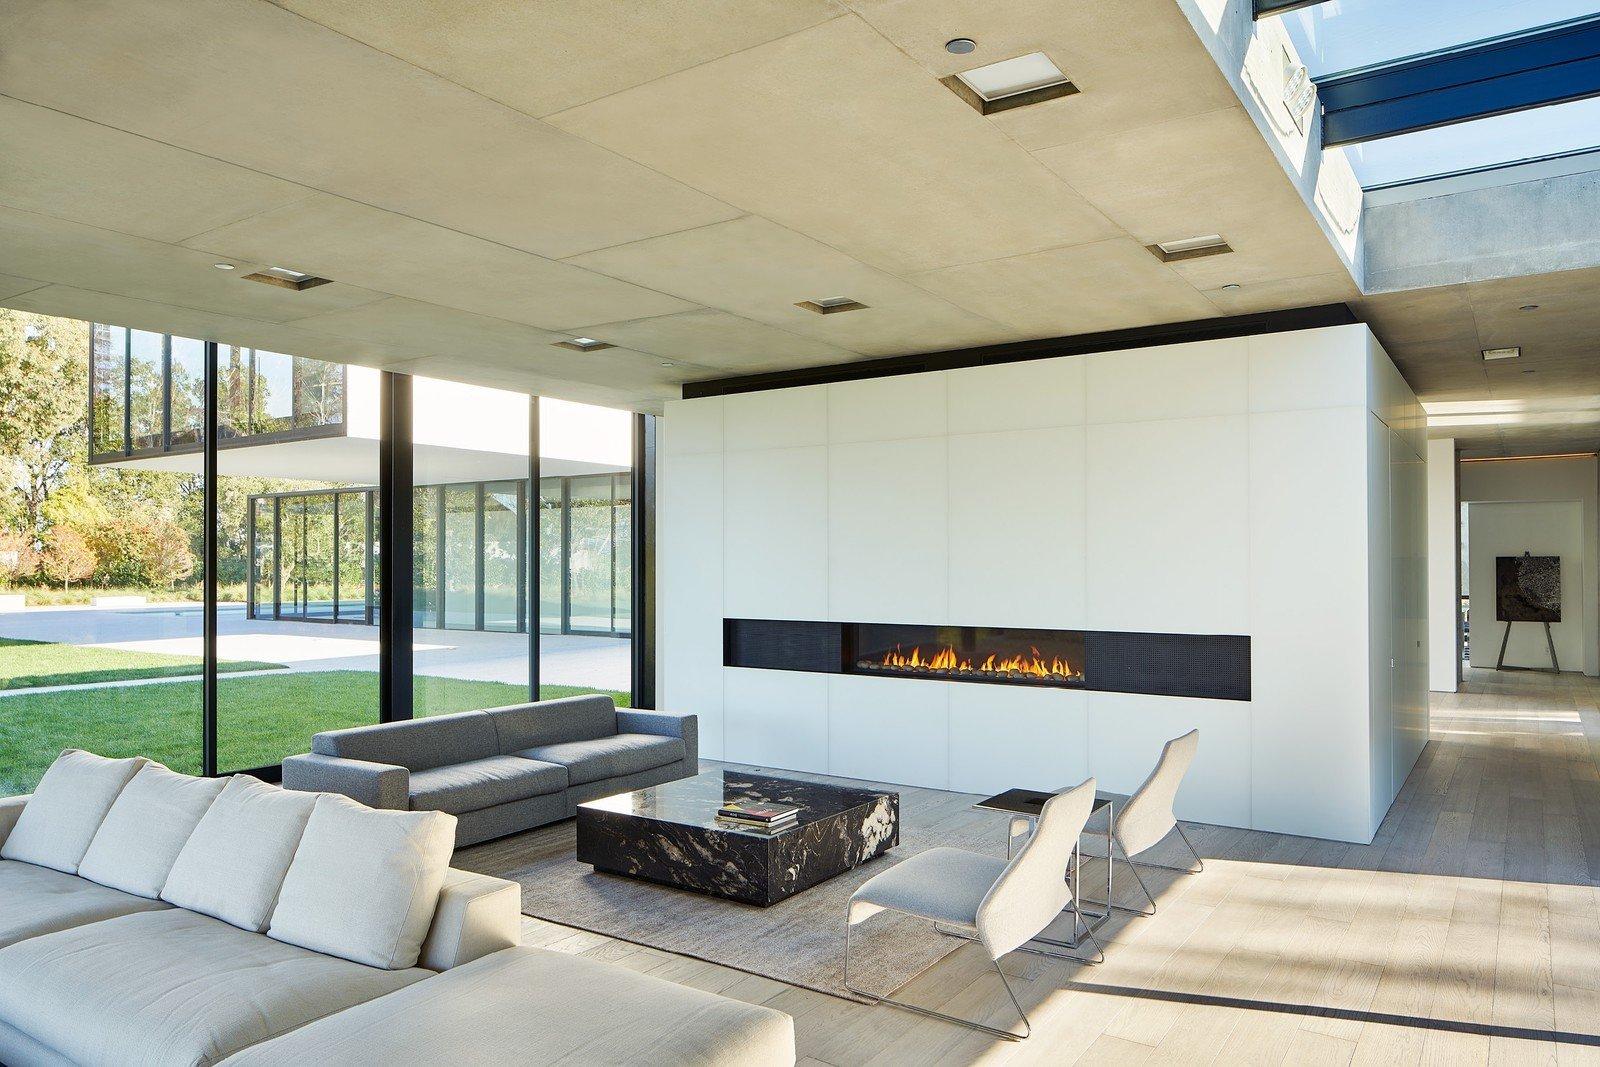 Tagged: Living Room, Gas Burning Fireplace, Ceiling Lighting, Sofa, and Light Hardwood Floor.  OZ Residence